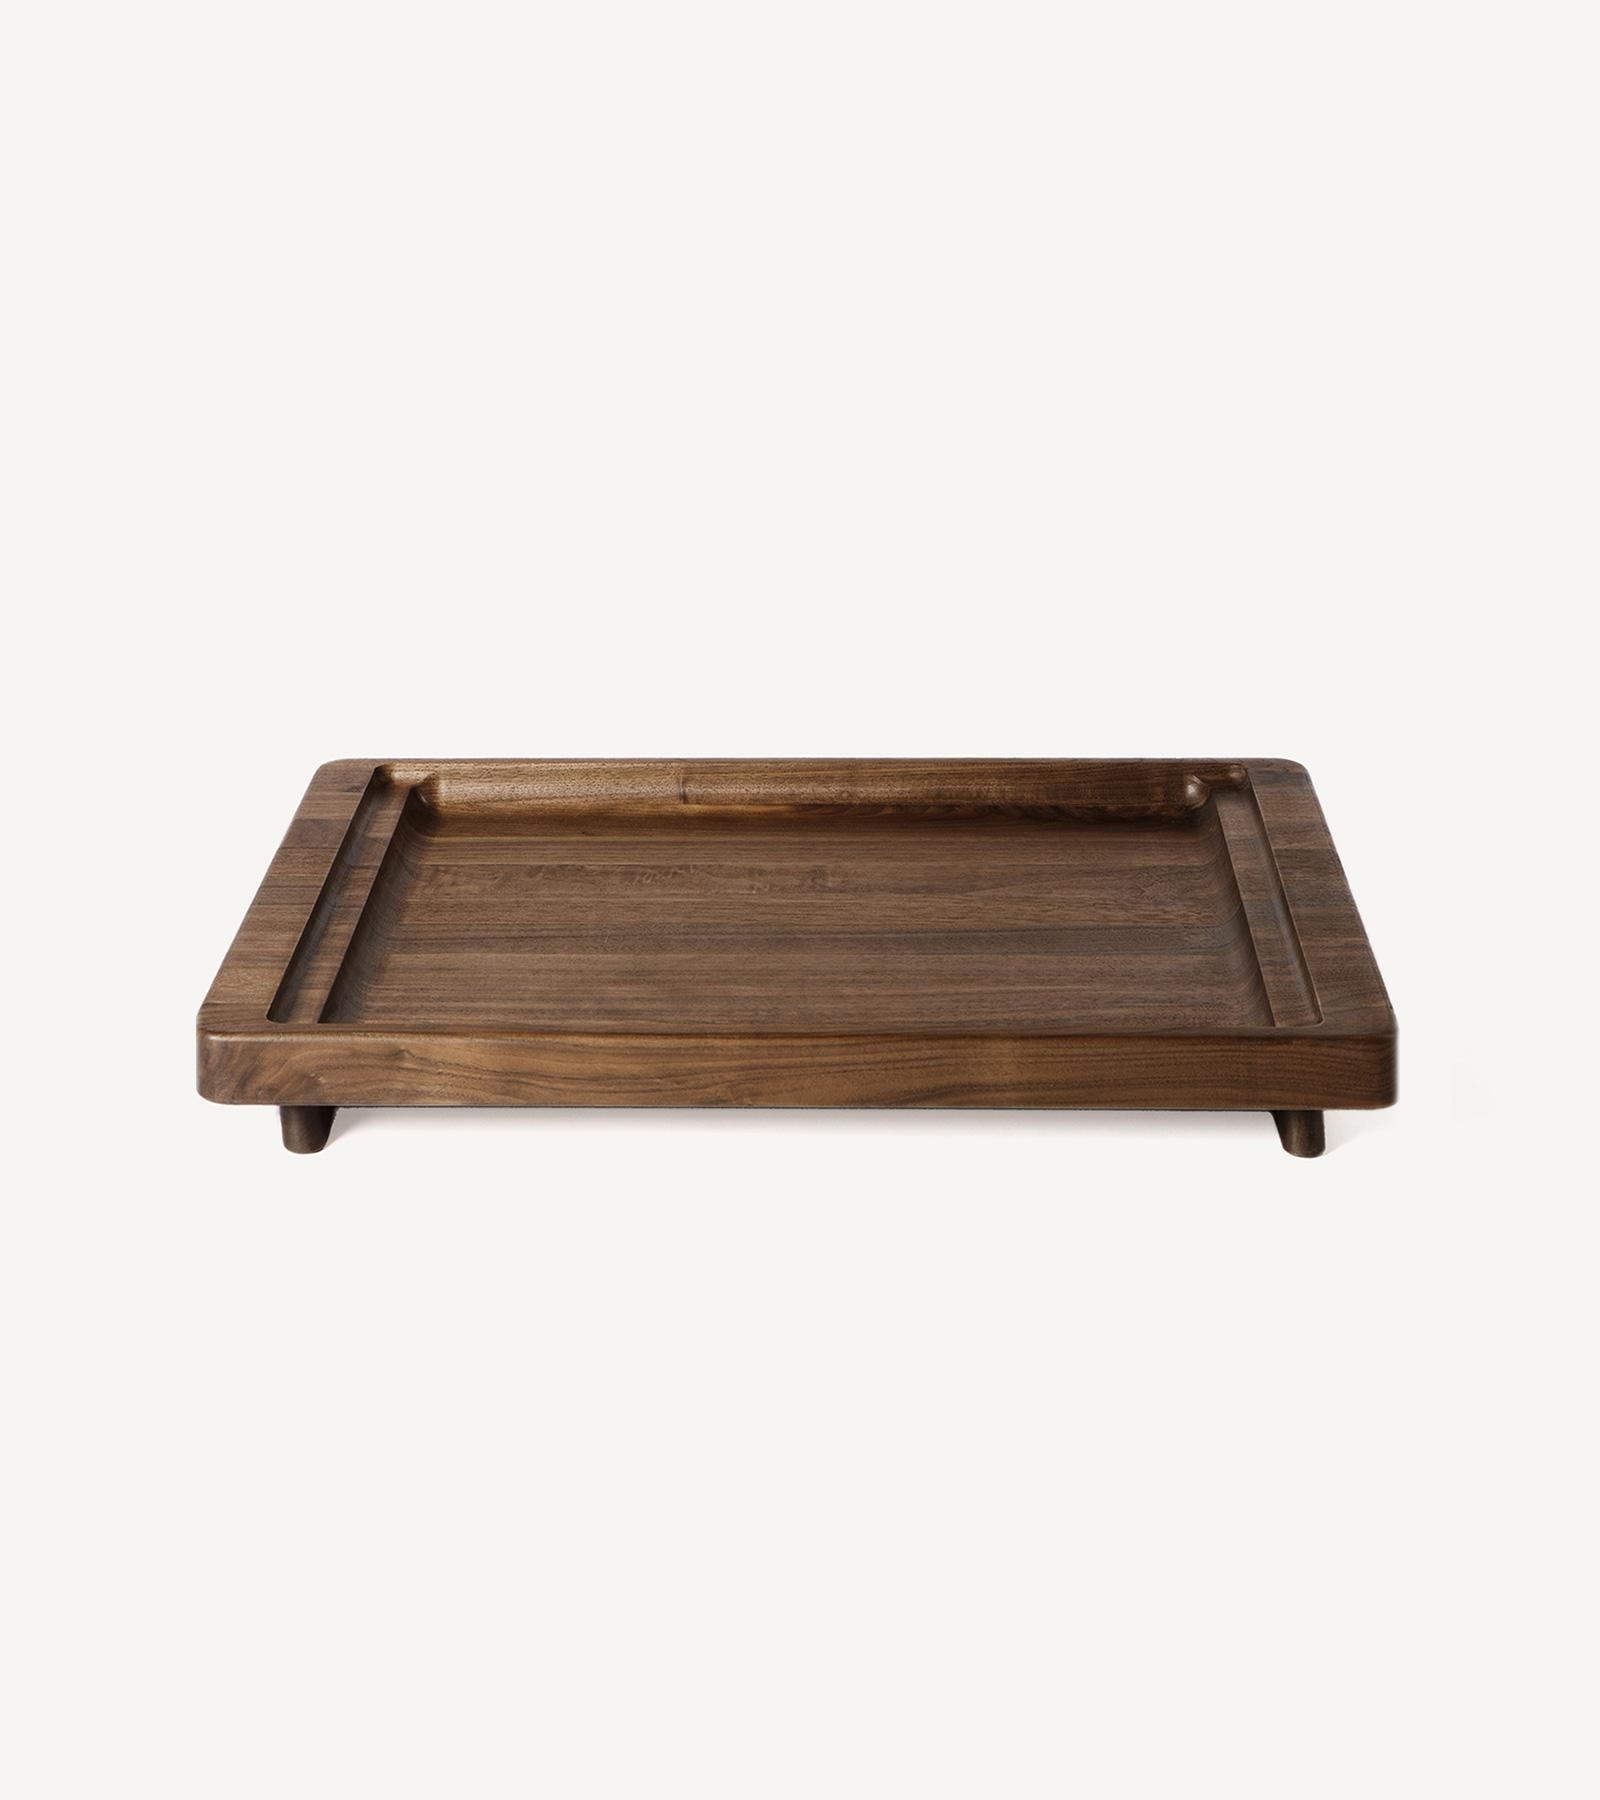 TinnappleMetz-bassamfellows-Tray-Rack-Side-Table-06